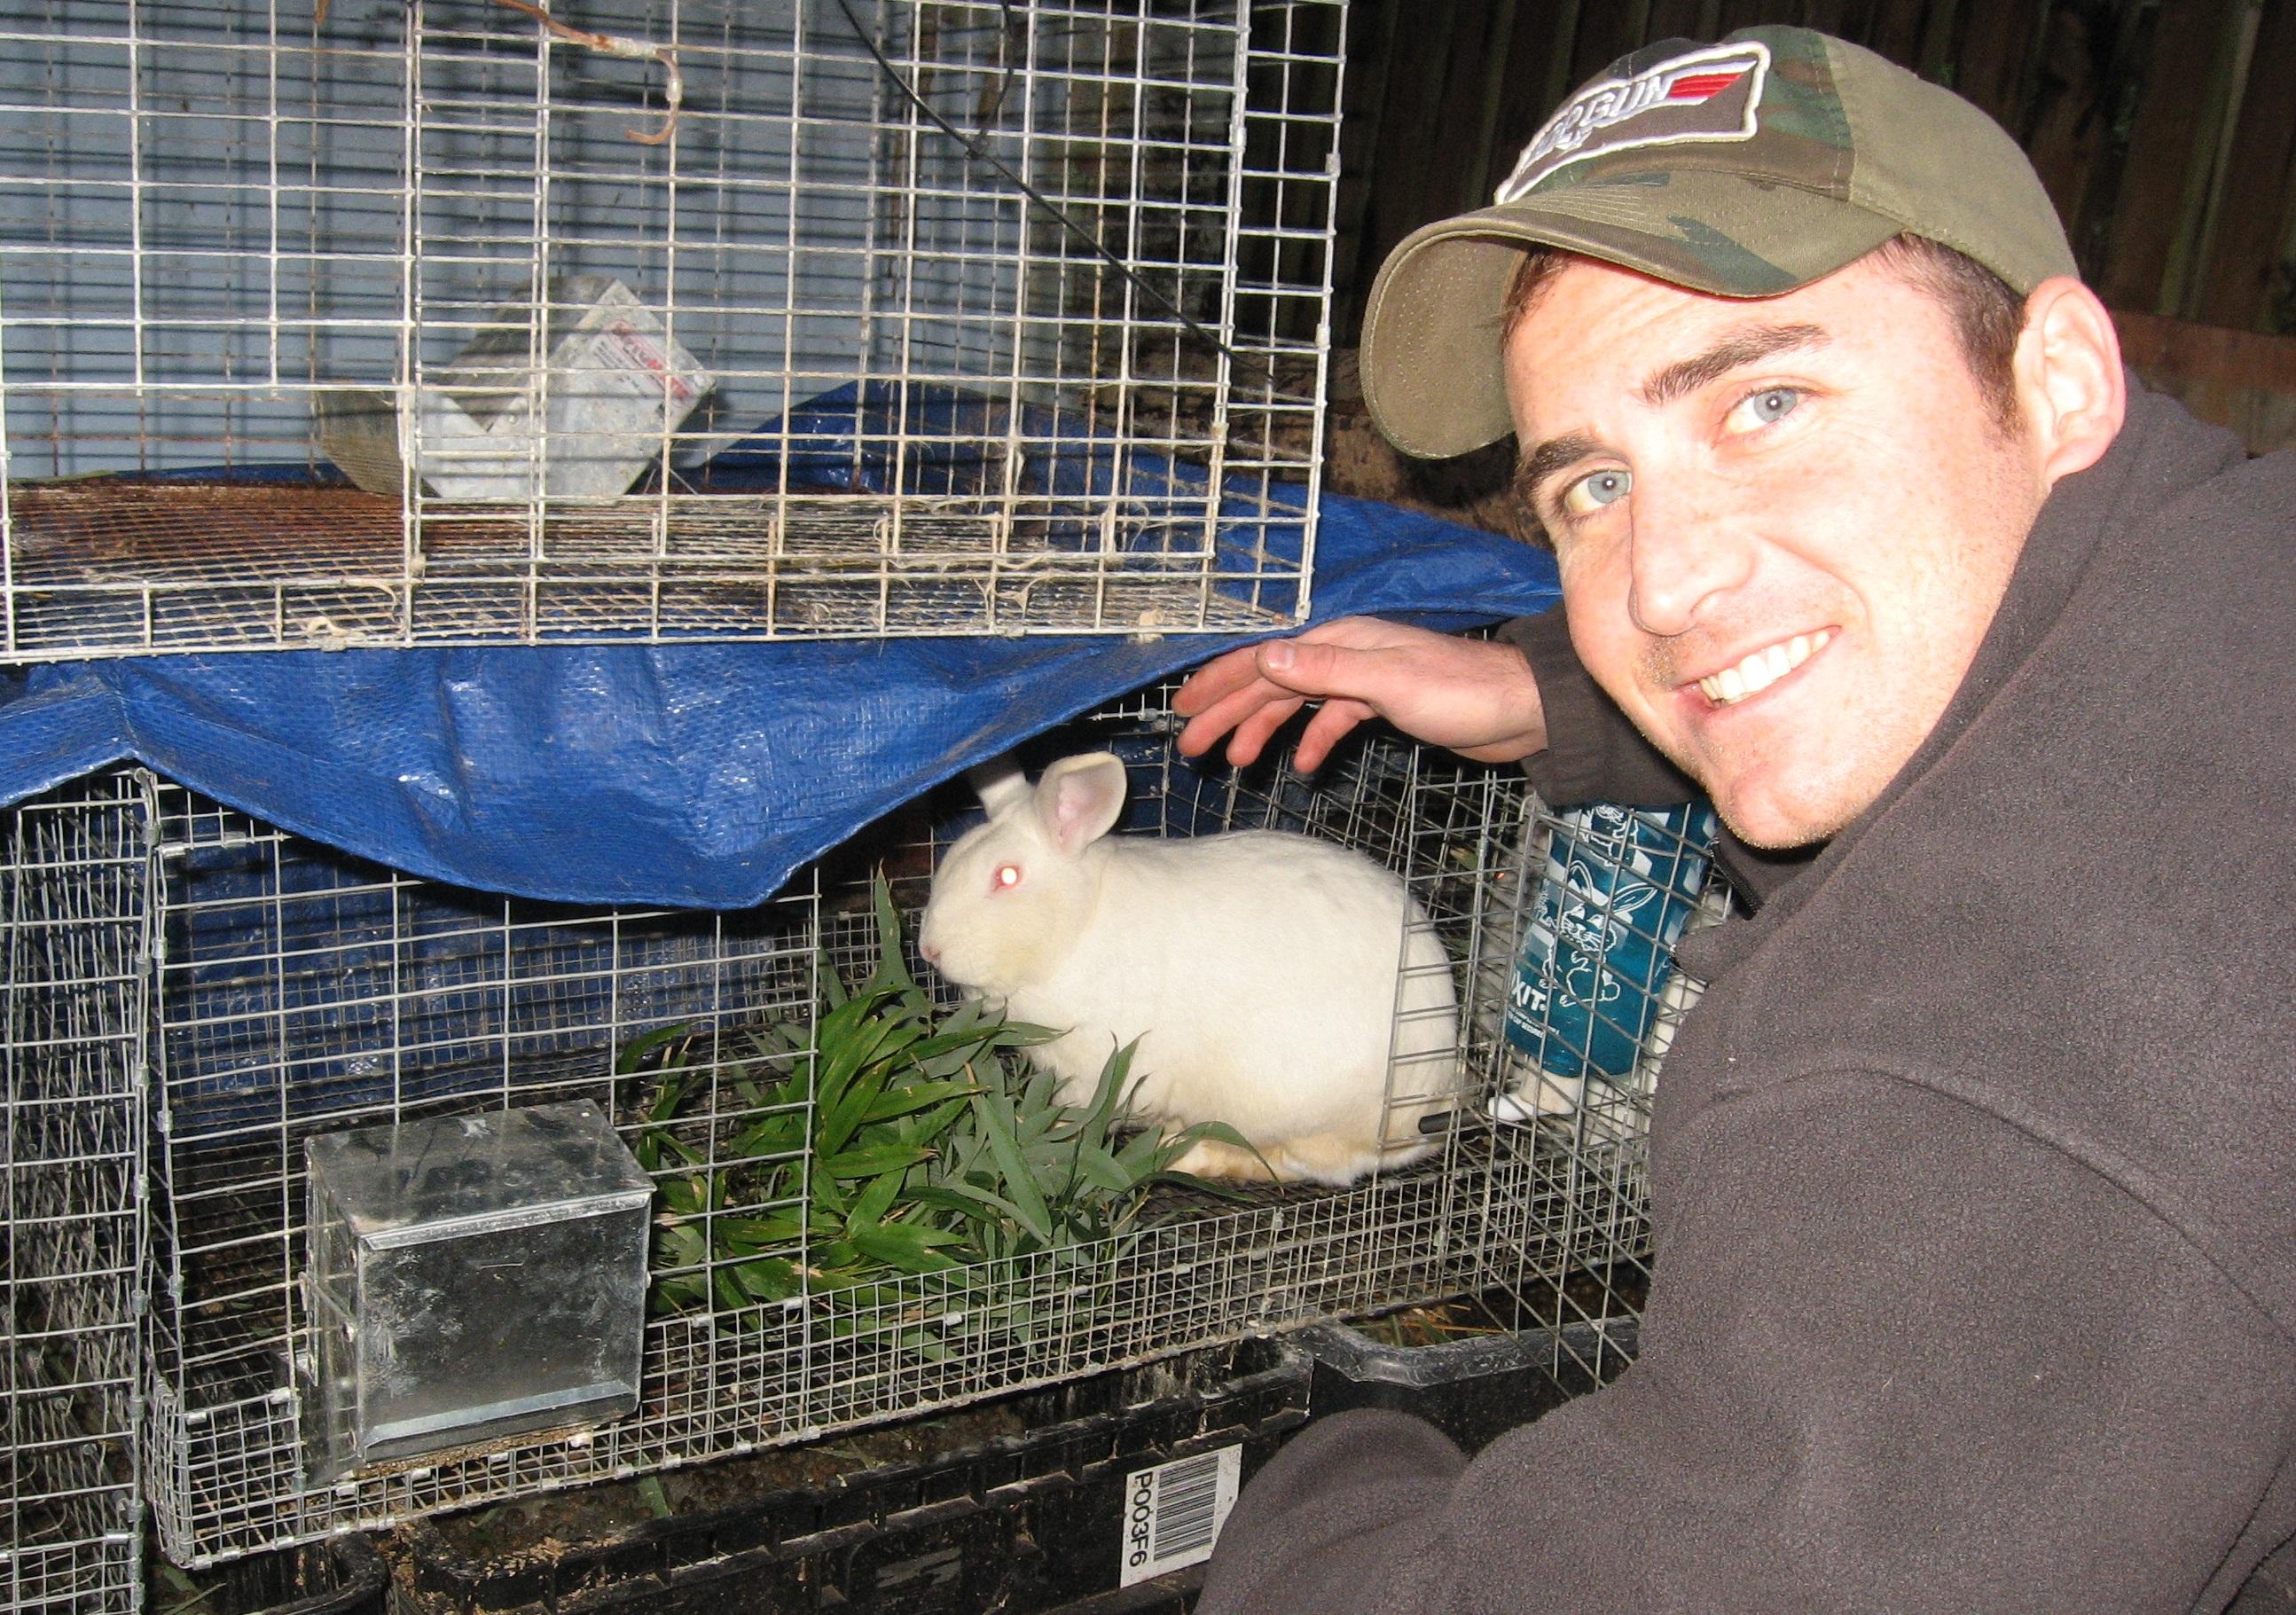 Craig feeding bamboo leaves to the rabbits